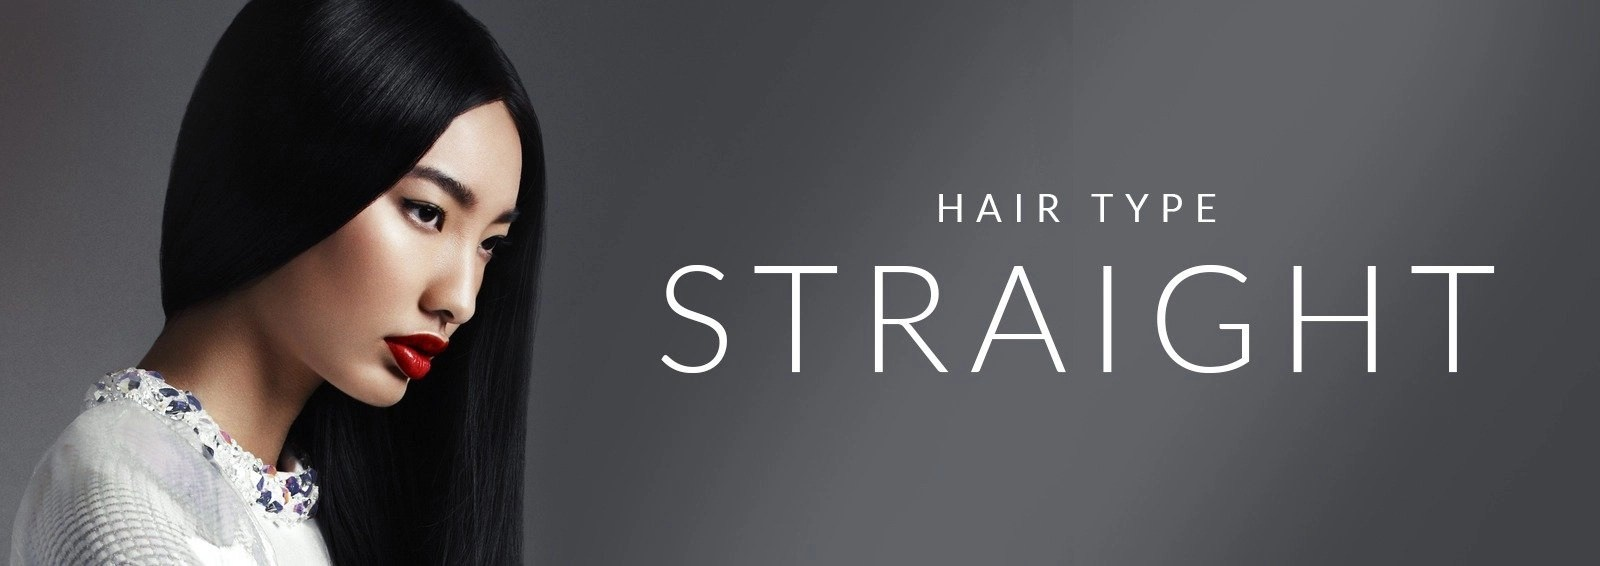 HairType Headers Straight